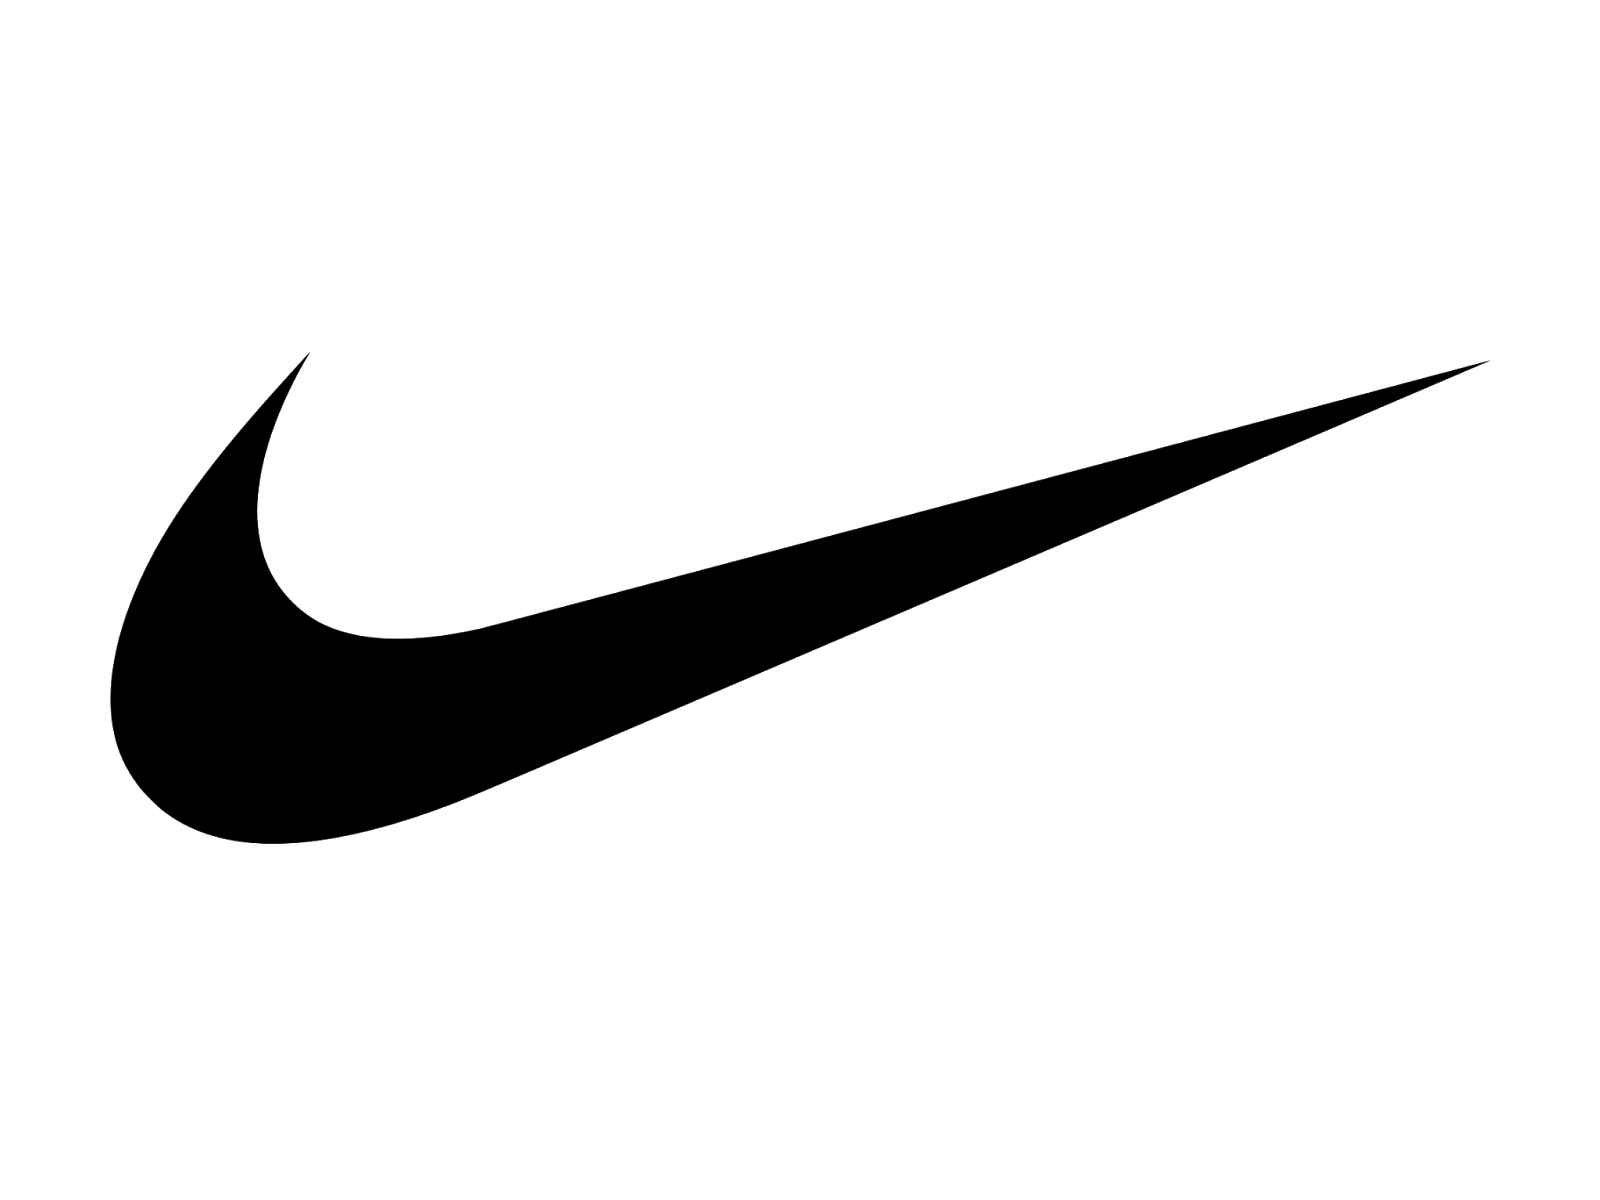 Sick Nike Logo - LogoDix - Sick Nike Logo